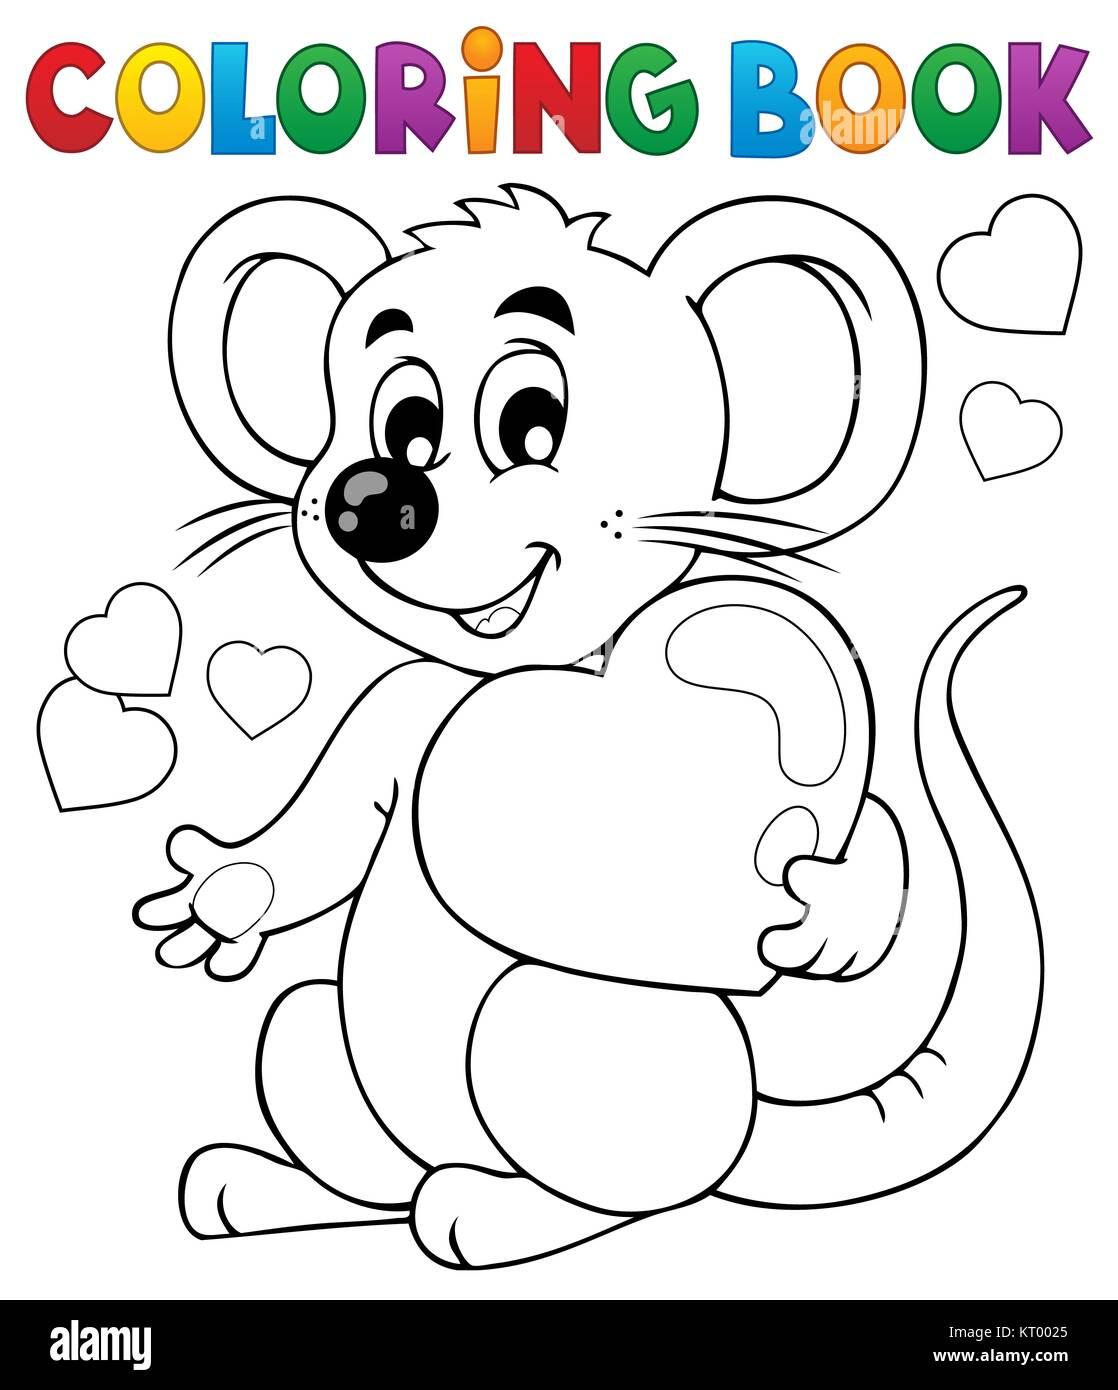 Coloring book Valentine topic 1 Stock Photo: 169645117 - Alamy